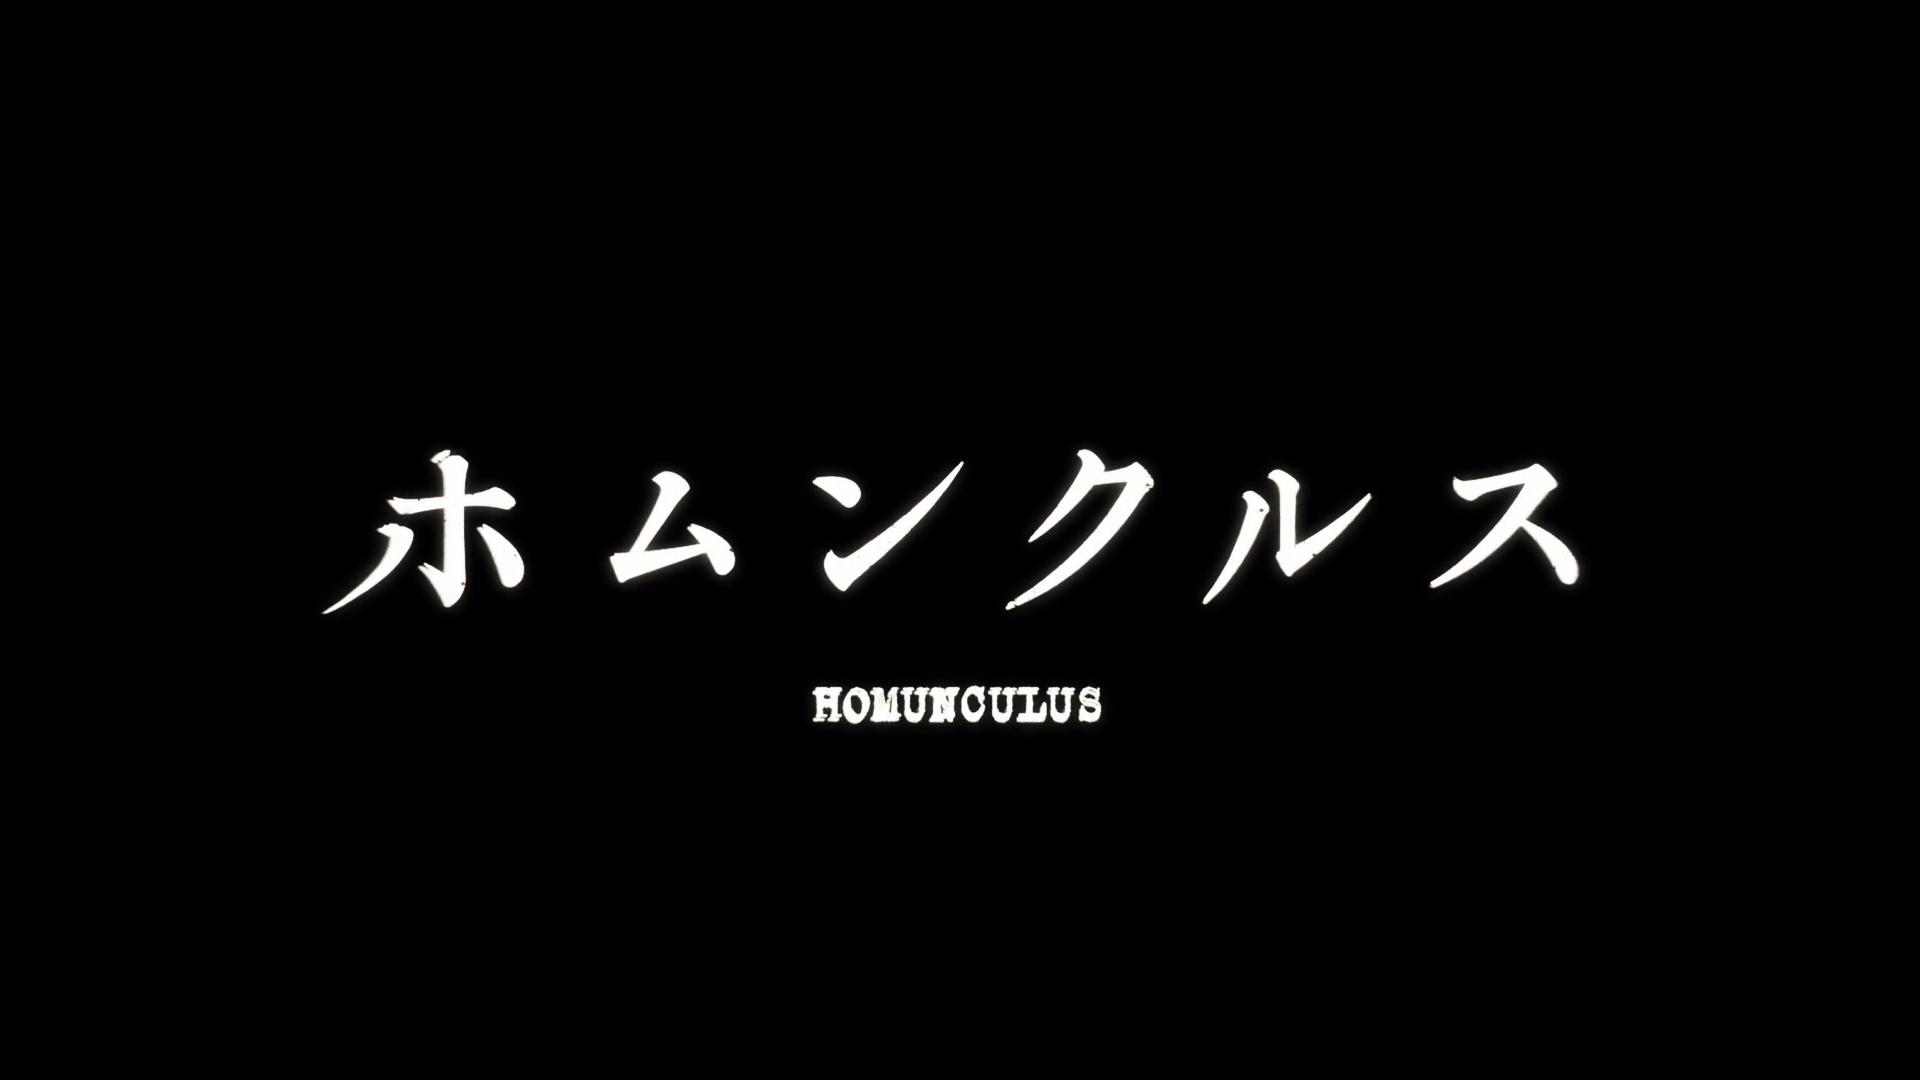 Homunculus (2021) 1080p WEB-DL